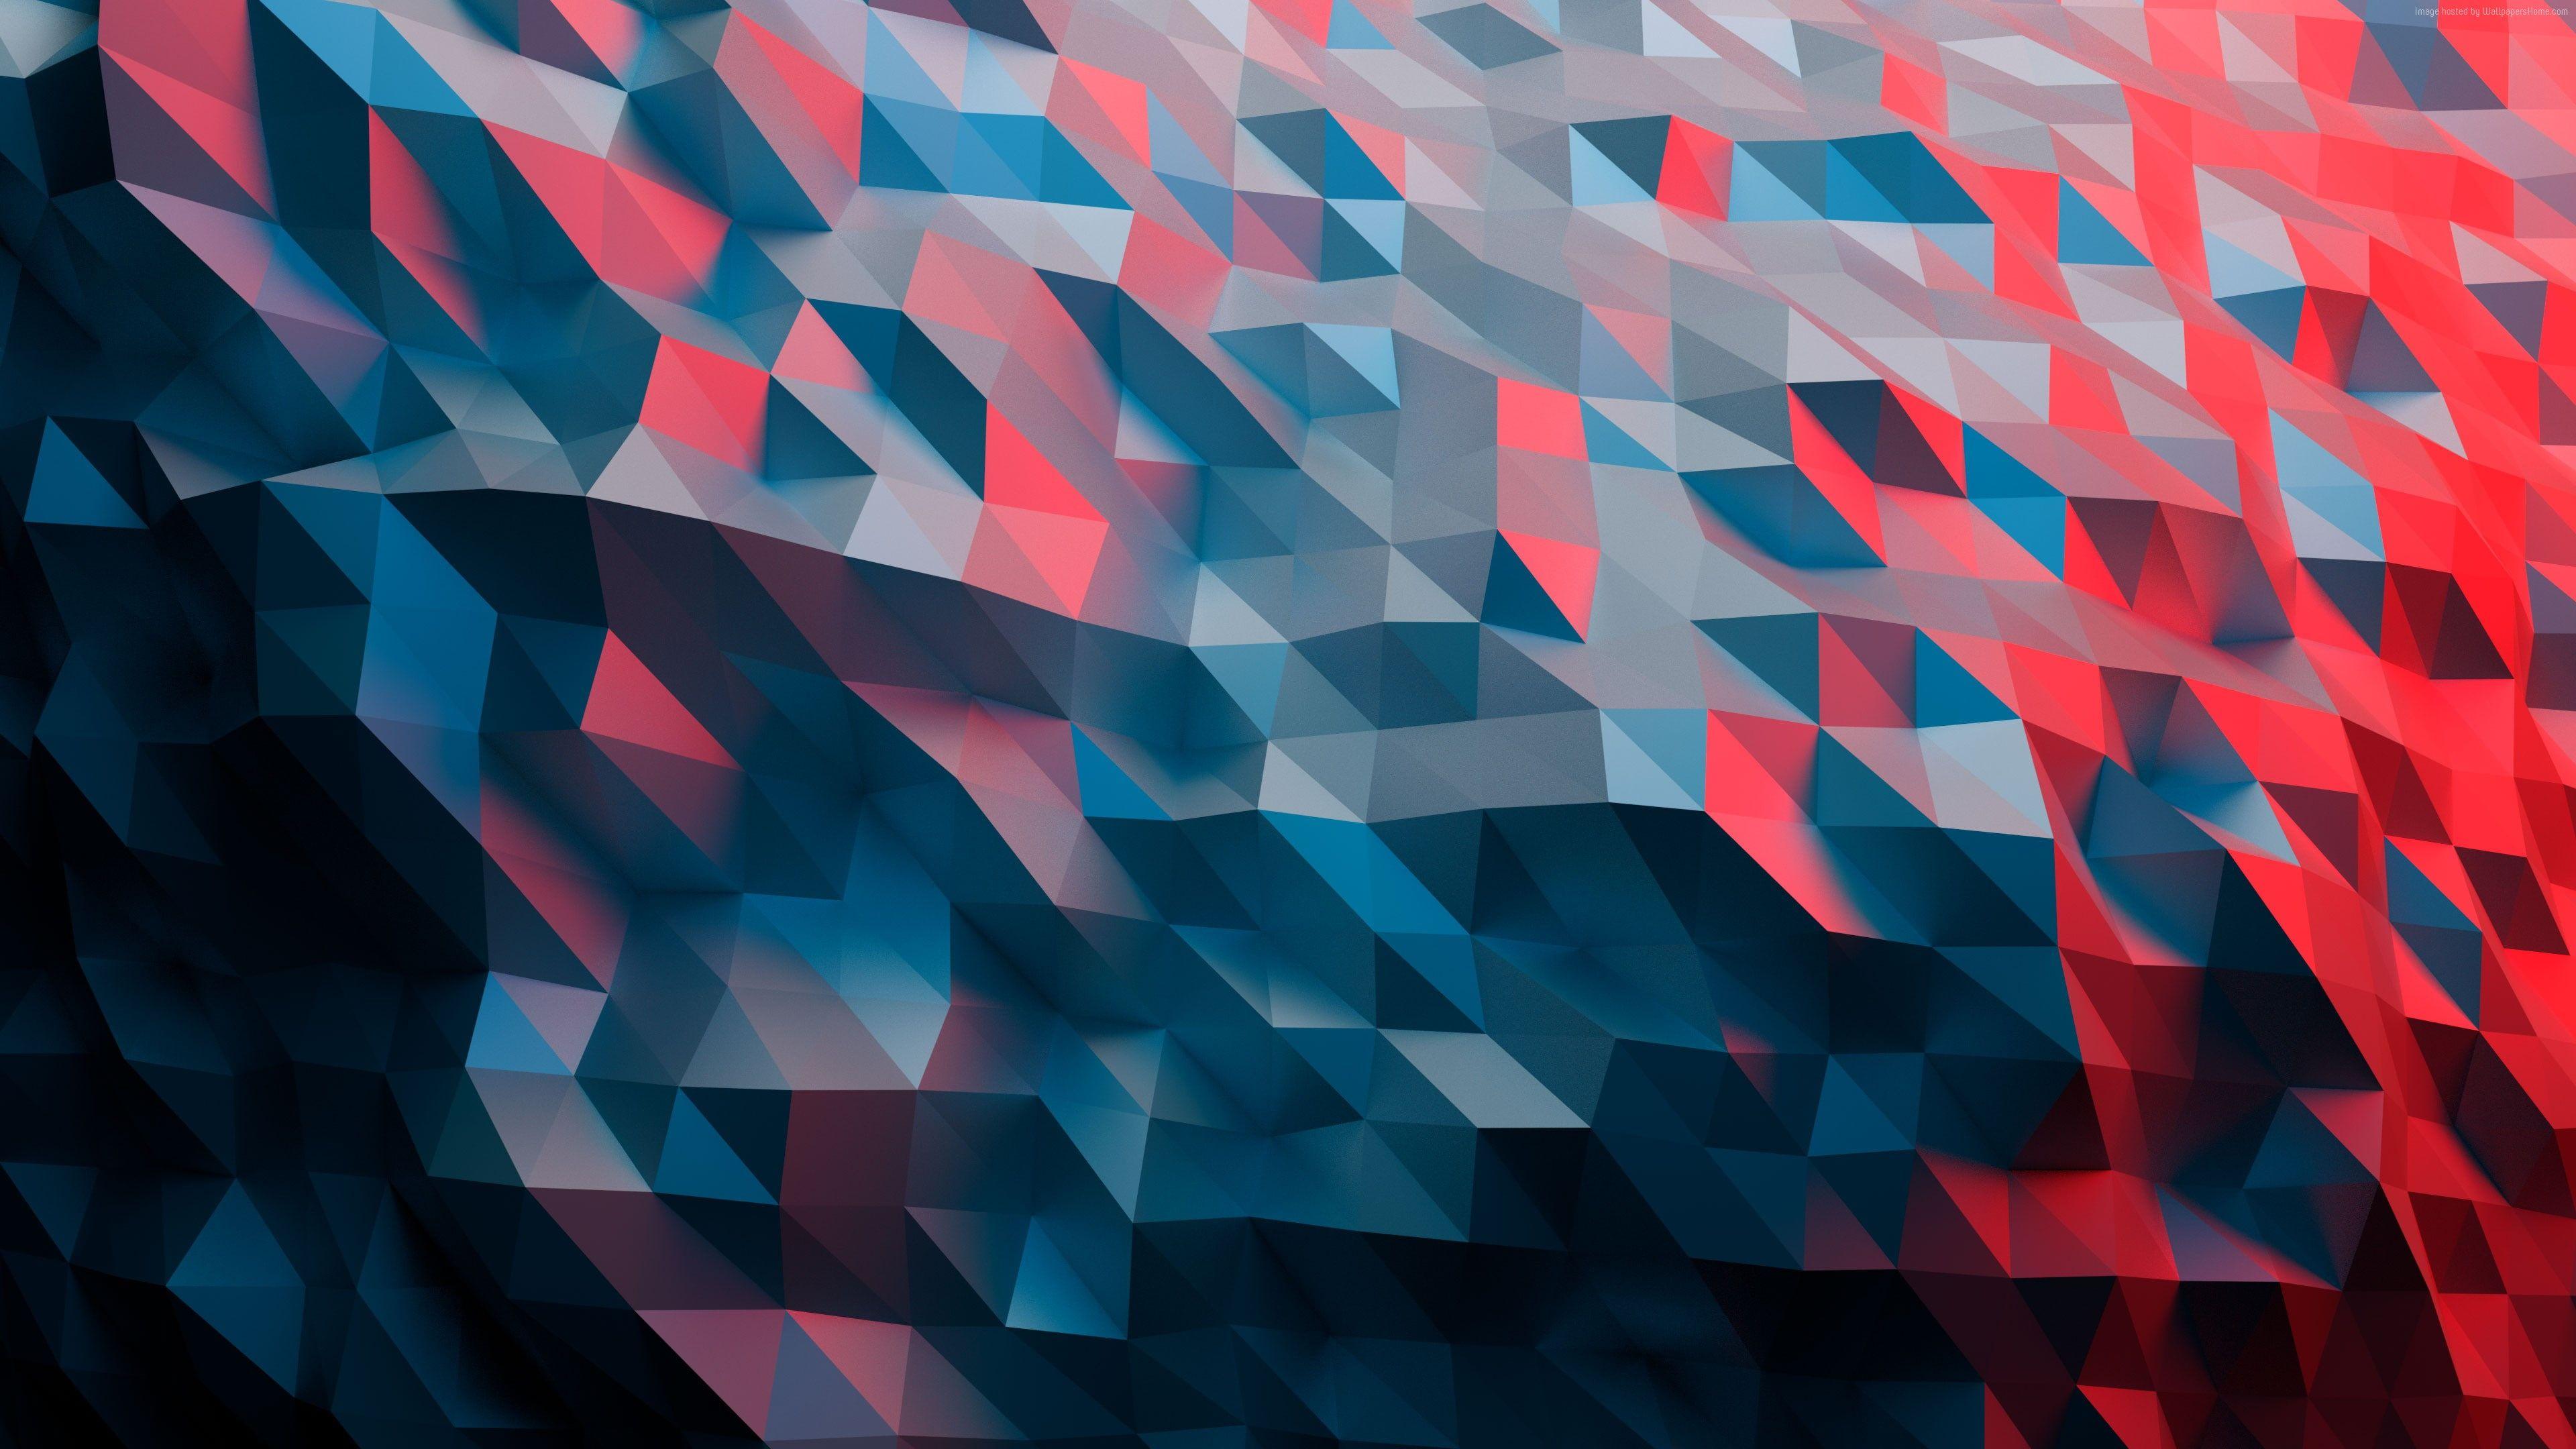 4k Polygon 4k Wallpaper Hdwallpaper Desktop In 2020 Abstract Wallpaper Abstract 3840x2160 Wallpaper